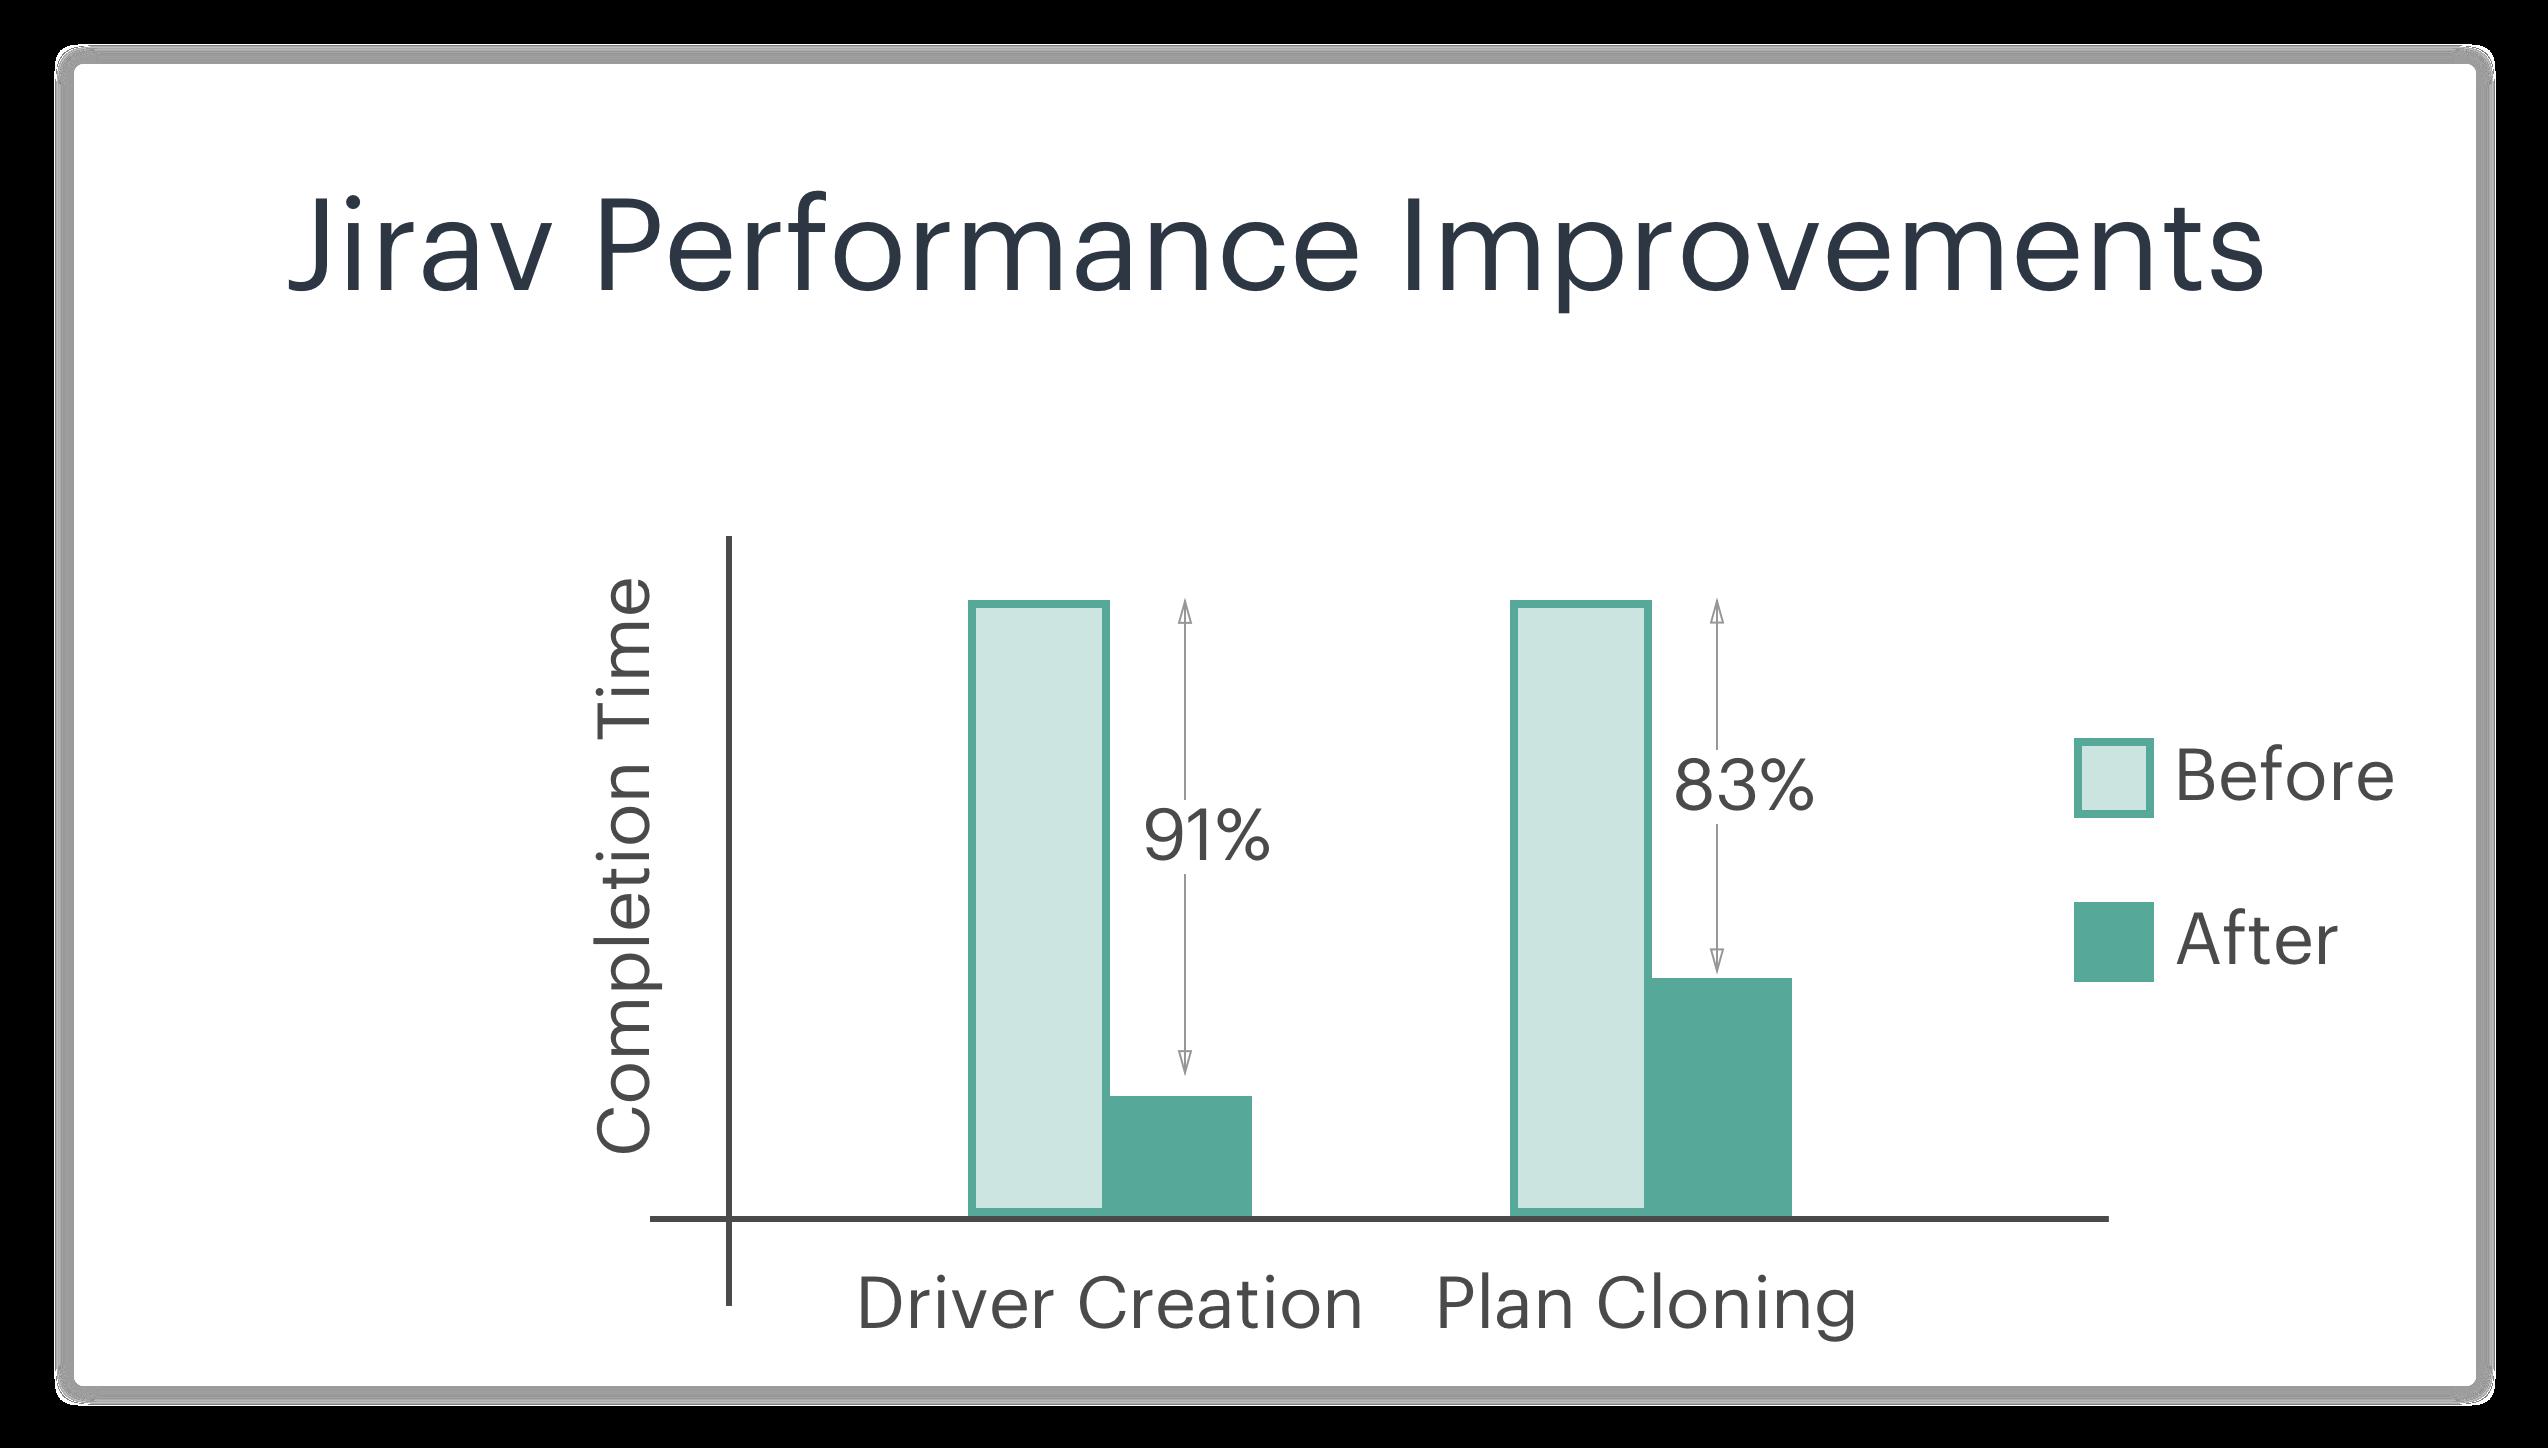 Jirav Performance Improvements-3